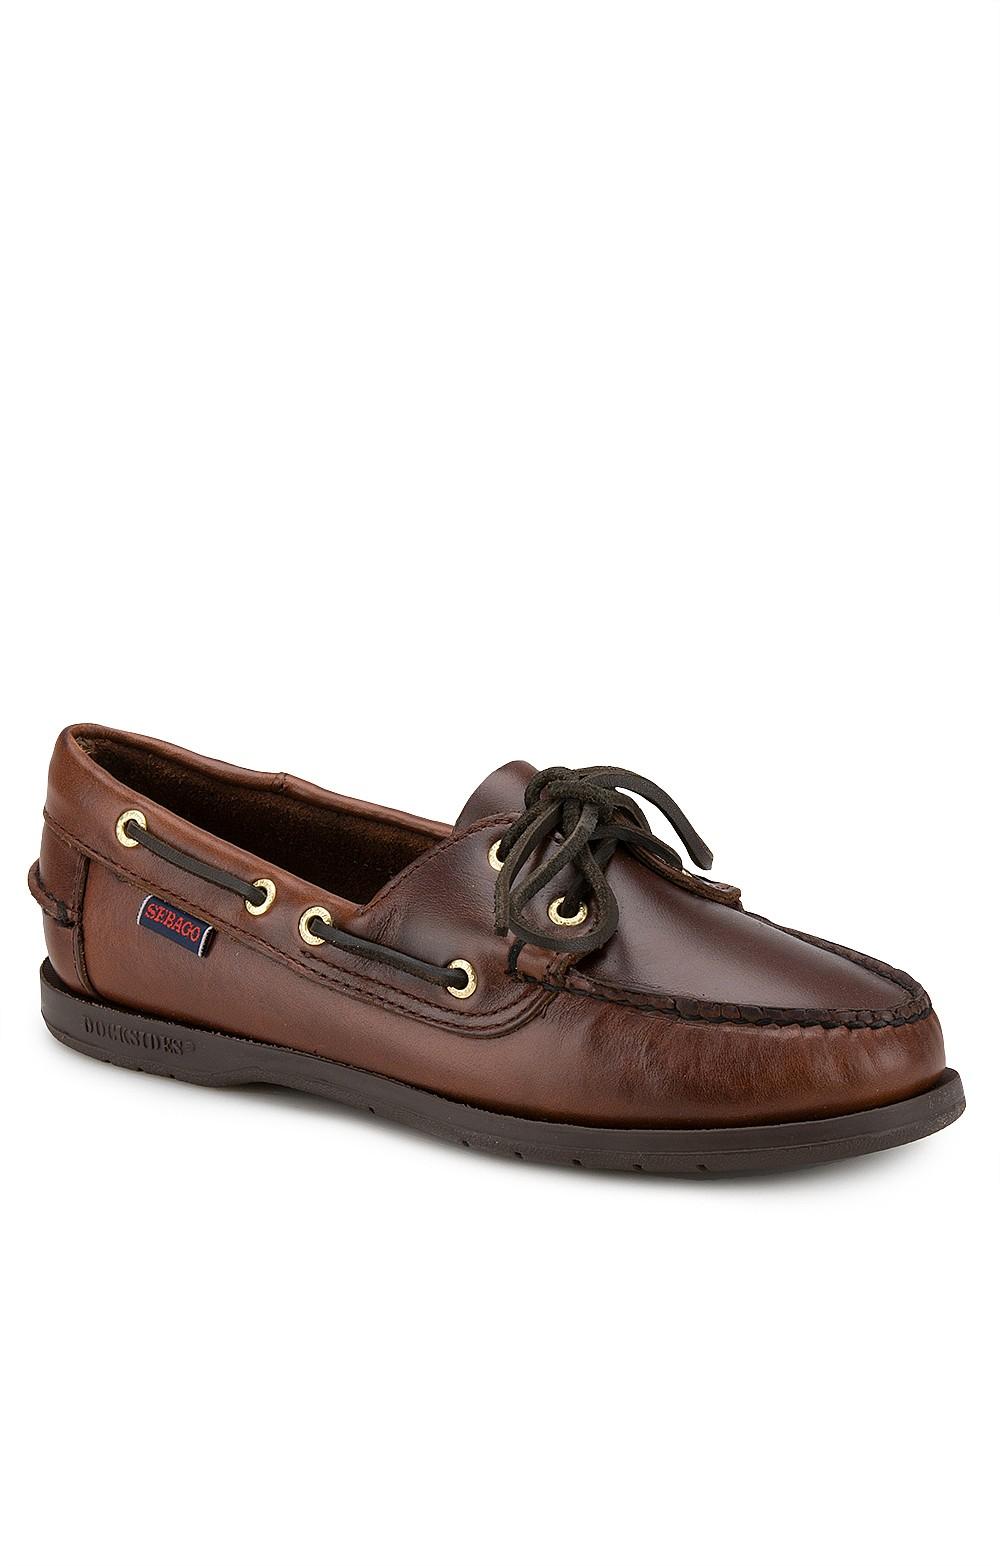 36161f0337 Sebago Boat Shoe